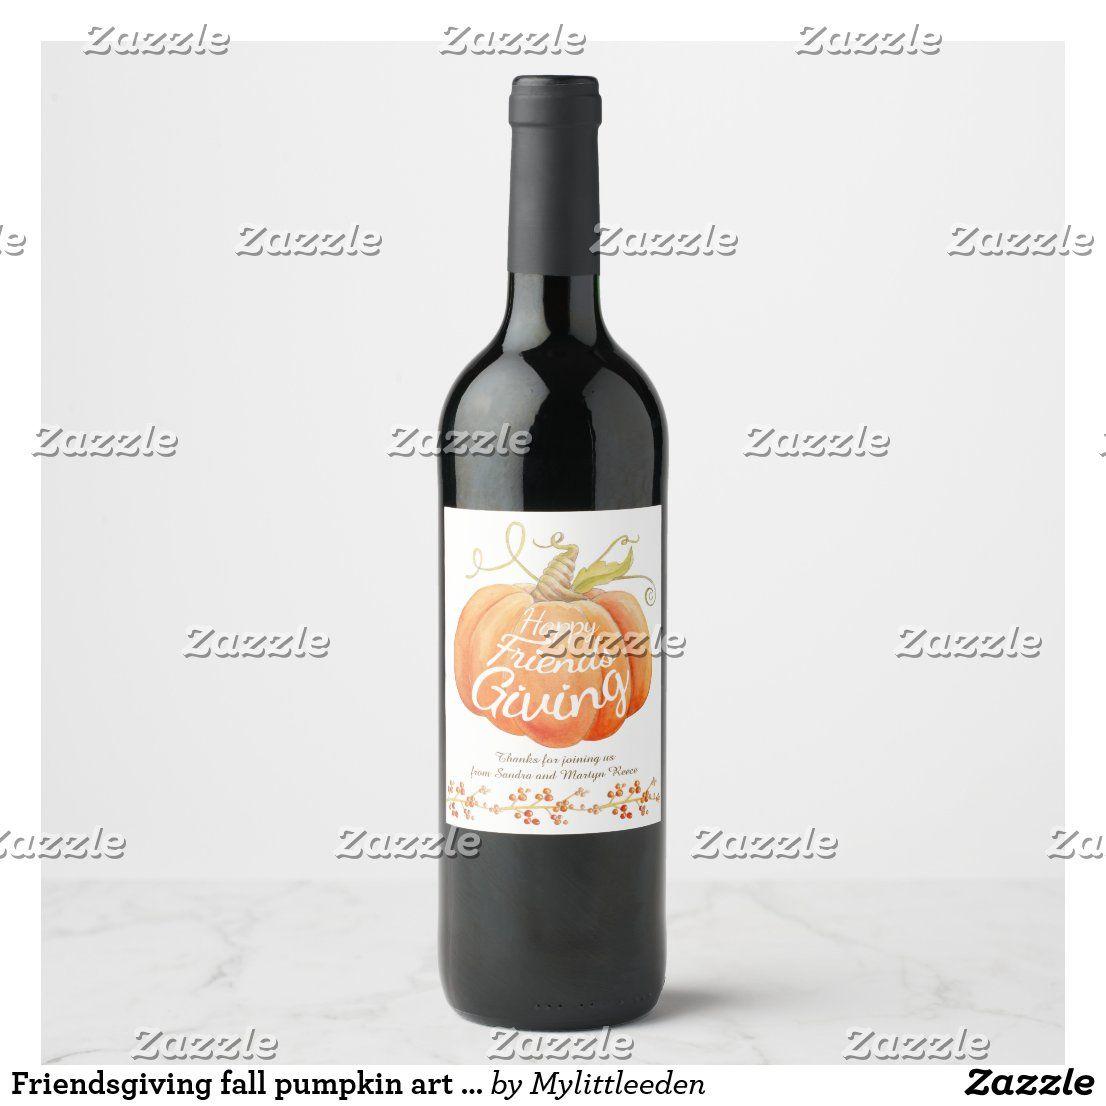 Friendsgiving fall pumpkin art custom wine labels | Zazzle.com